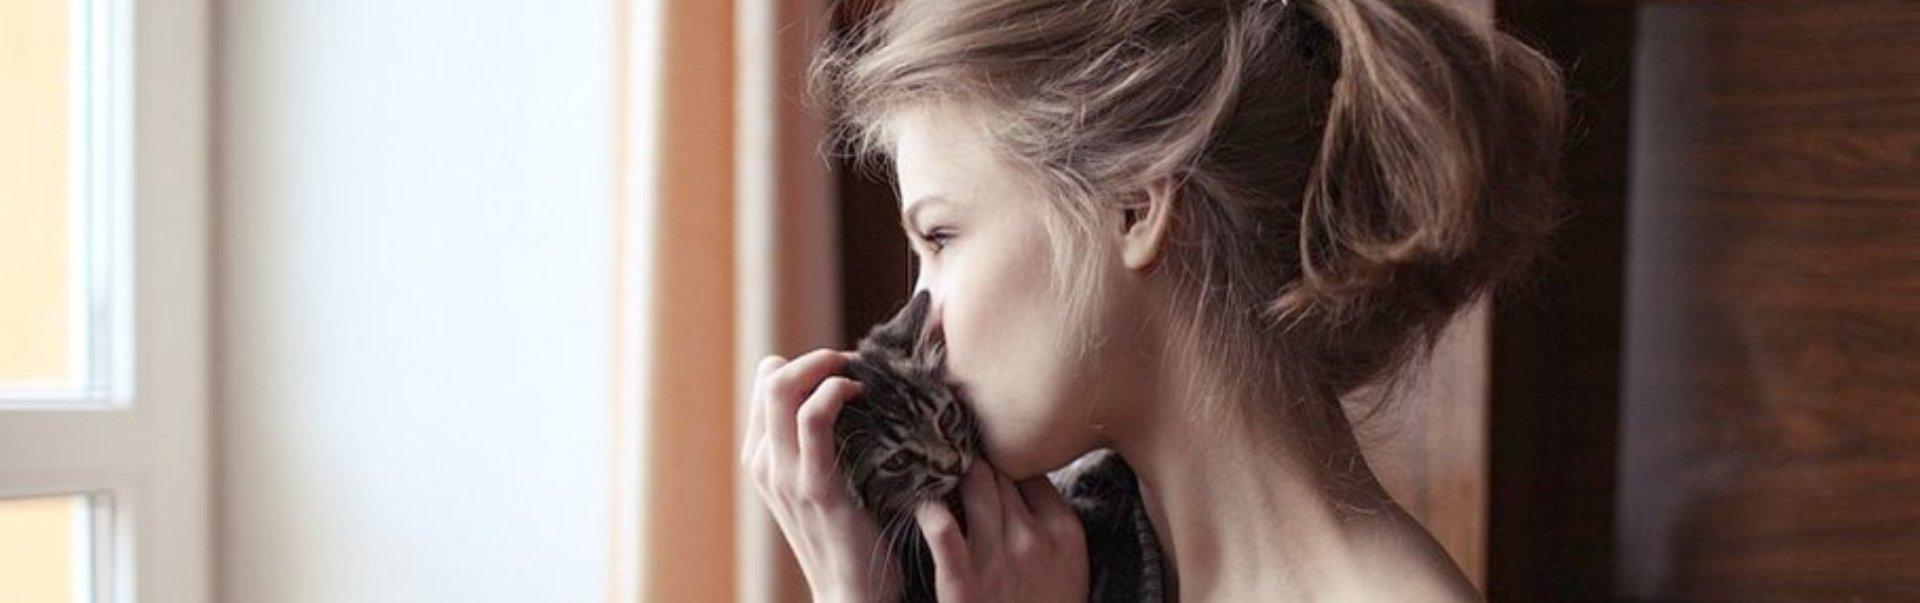 Cum te-a schimbat pisica ta: 5 modalități prin care te-a făcut un om mai bun